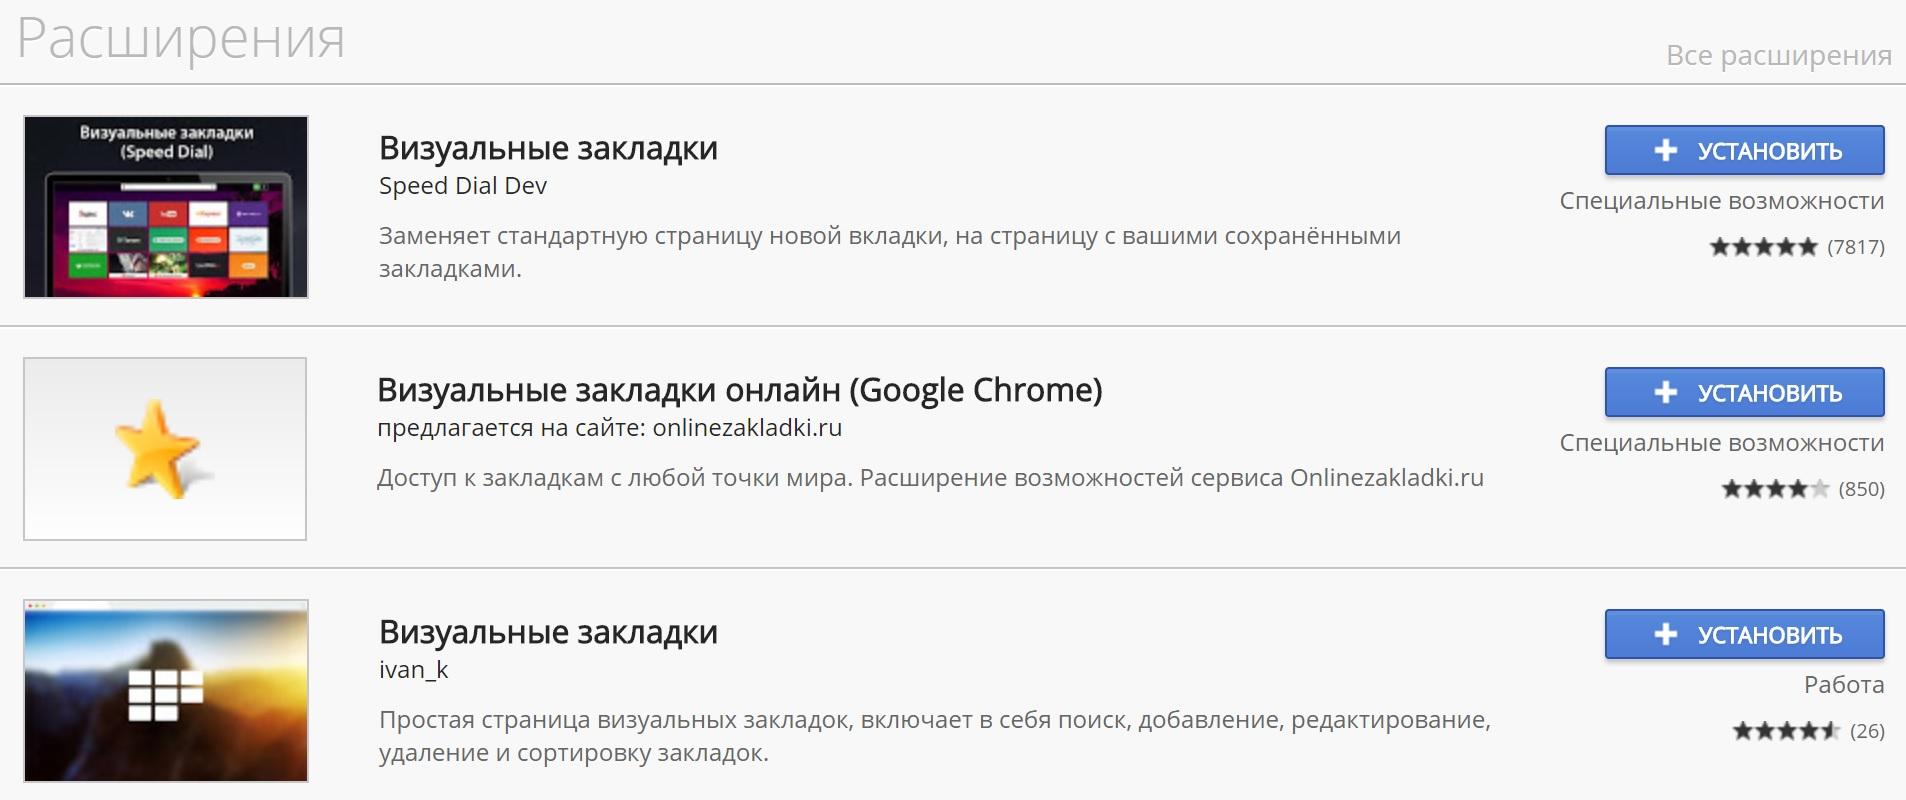 Программы для Гугл Хром